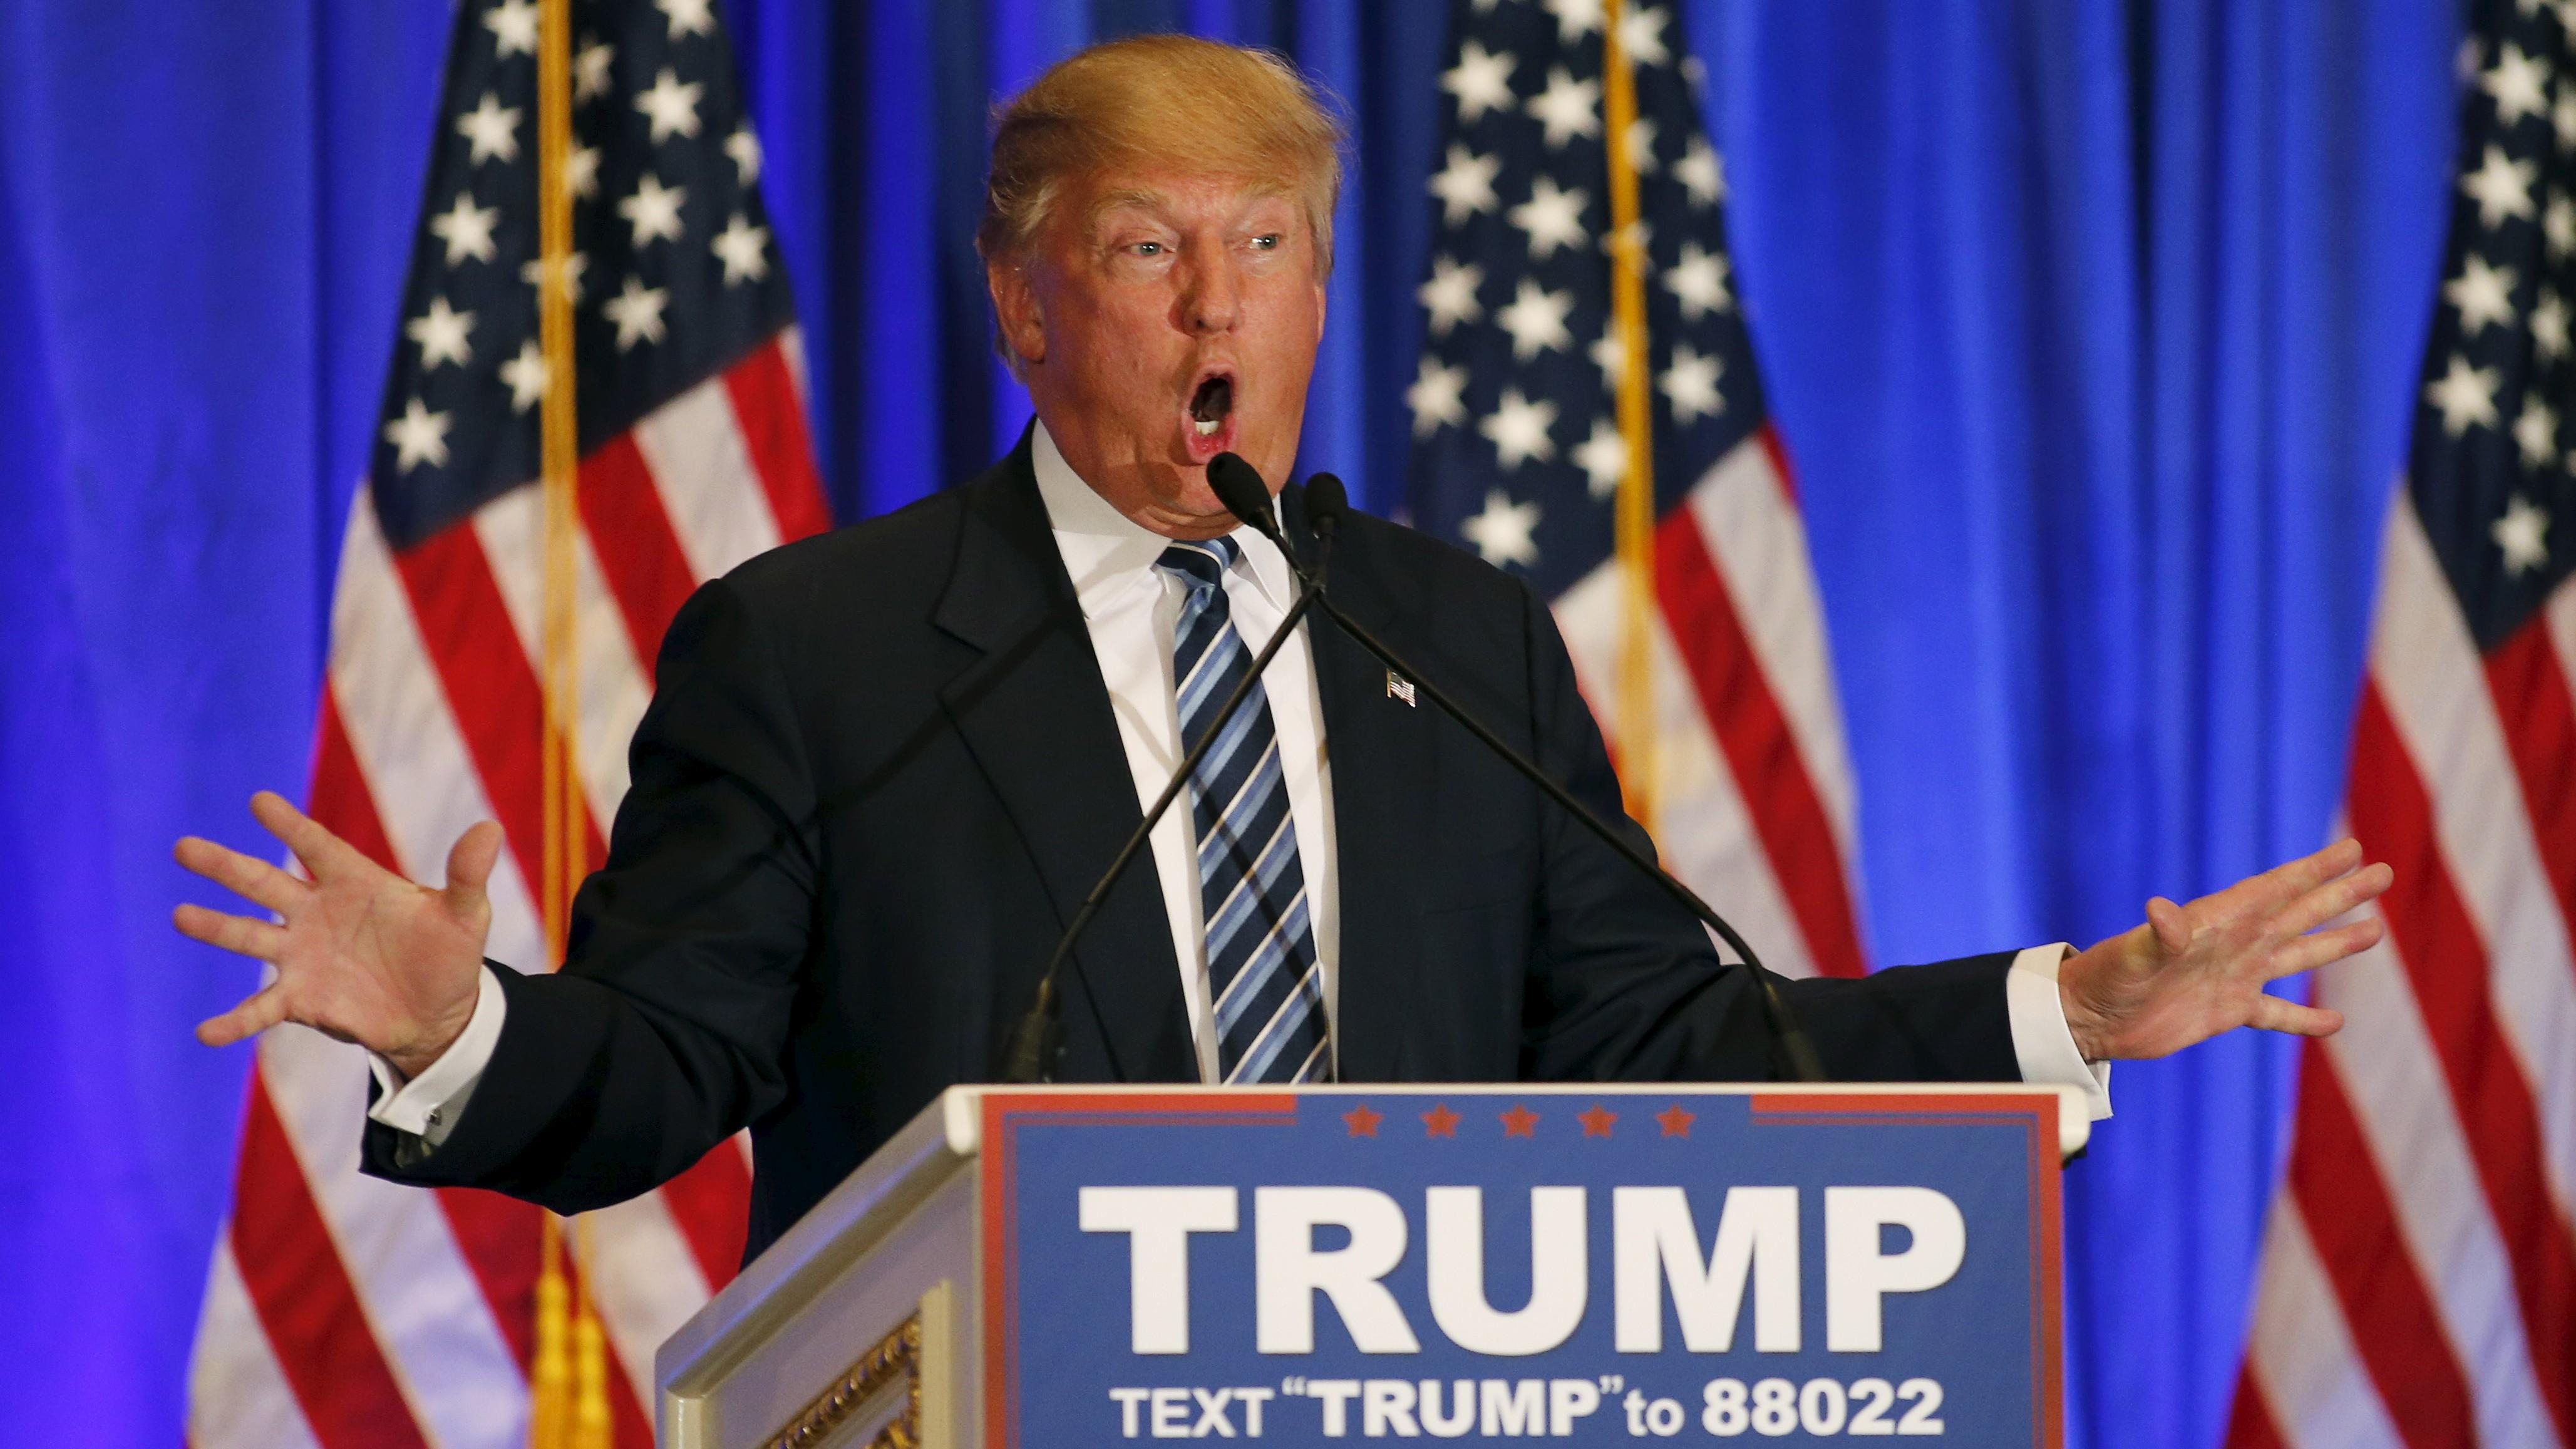 photo of donald trump at podium